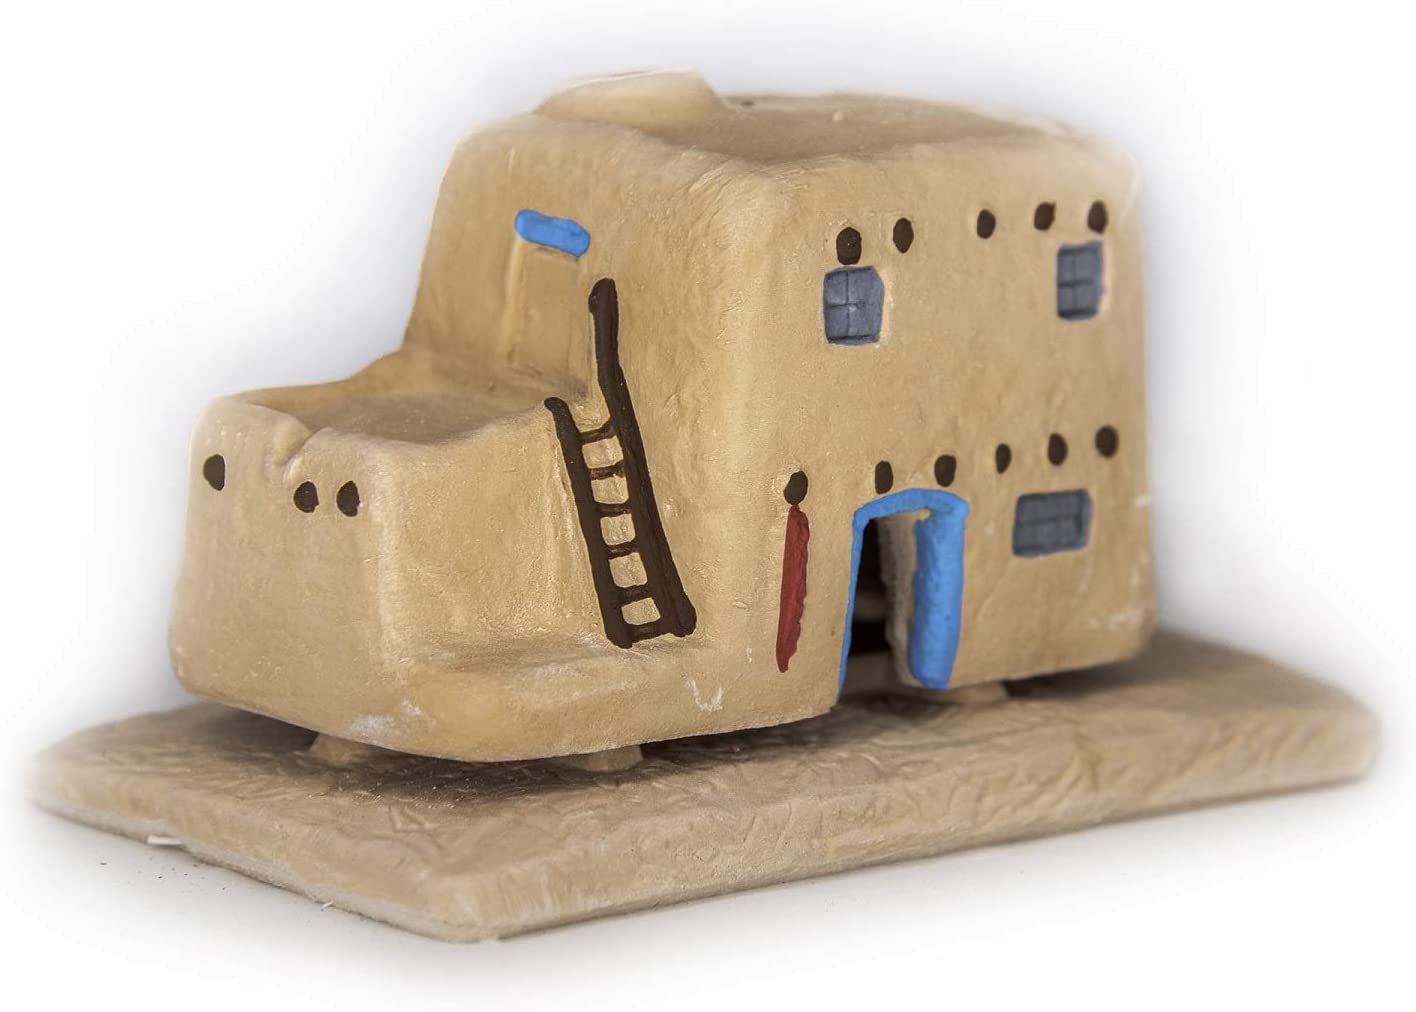 Incienso de Santa Fe - Casa de Adobe Natural Wood Incense Burner, Includes 20 Piñon Incense Bricks